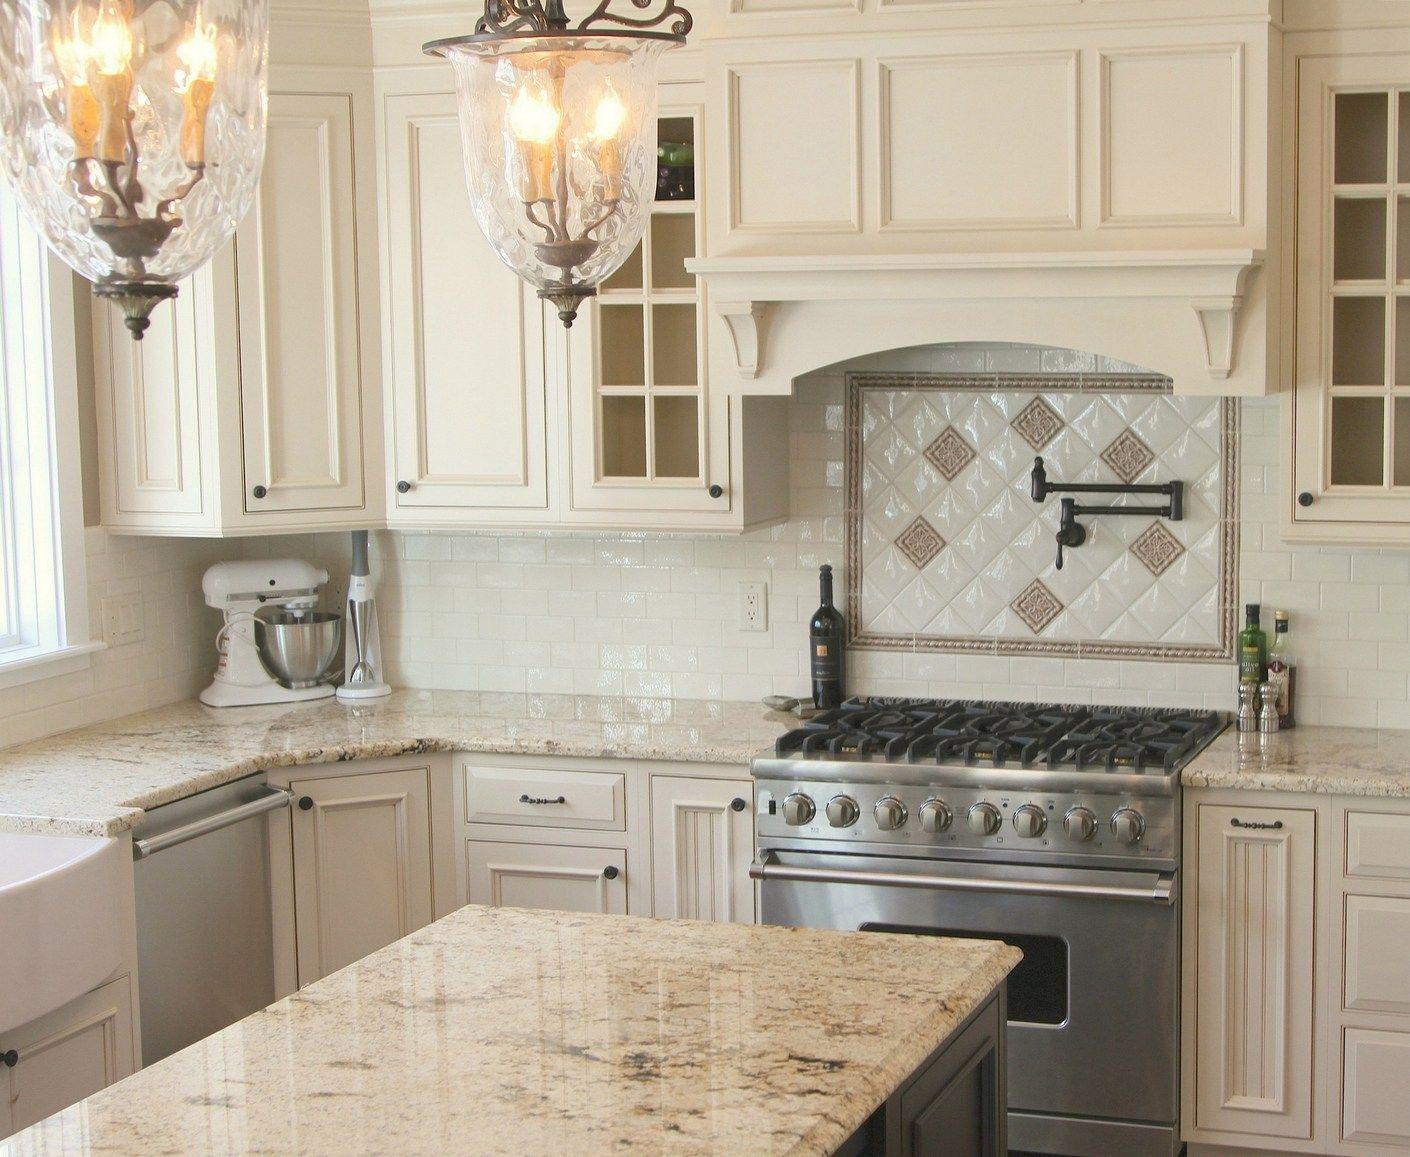 Simple and elegant cream colored kitchen cabinets design ideas